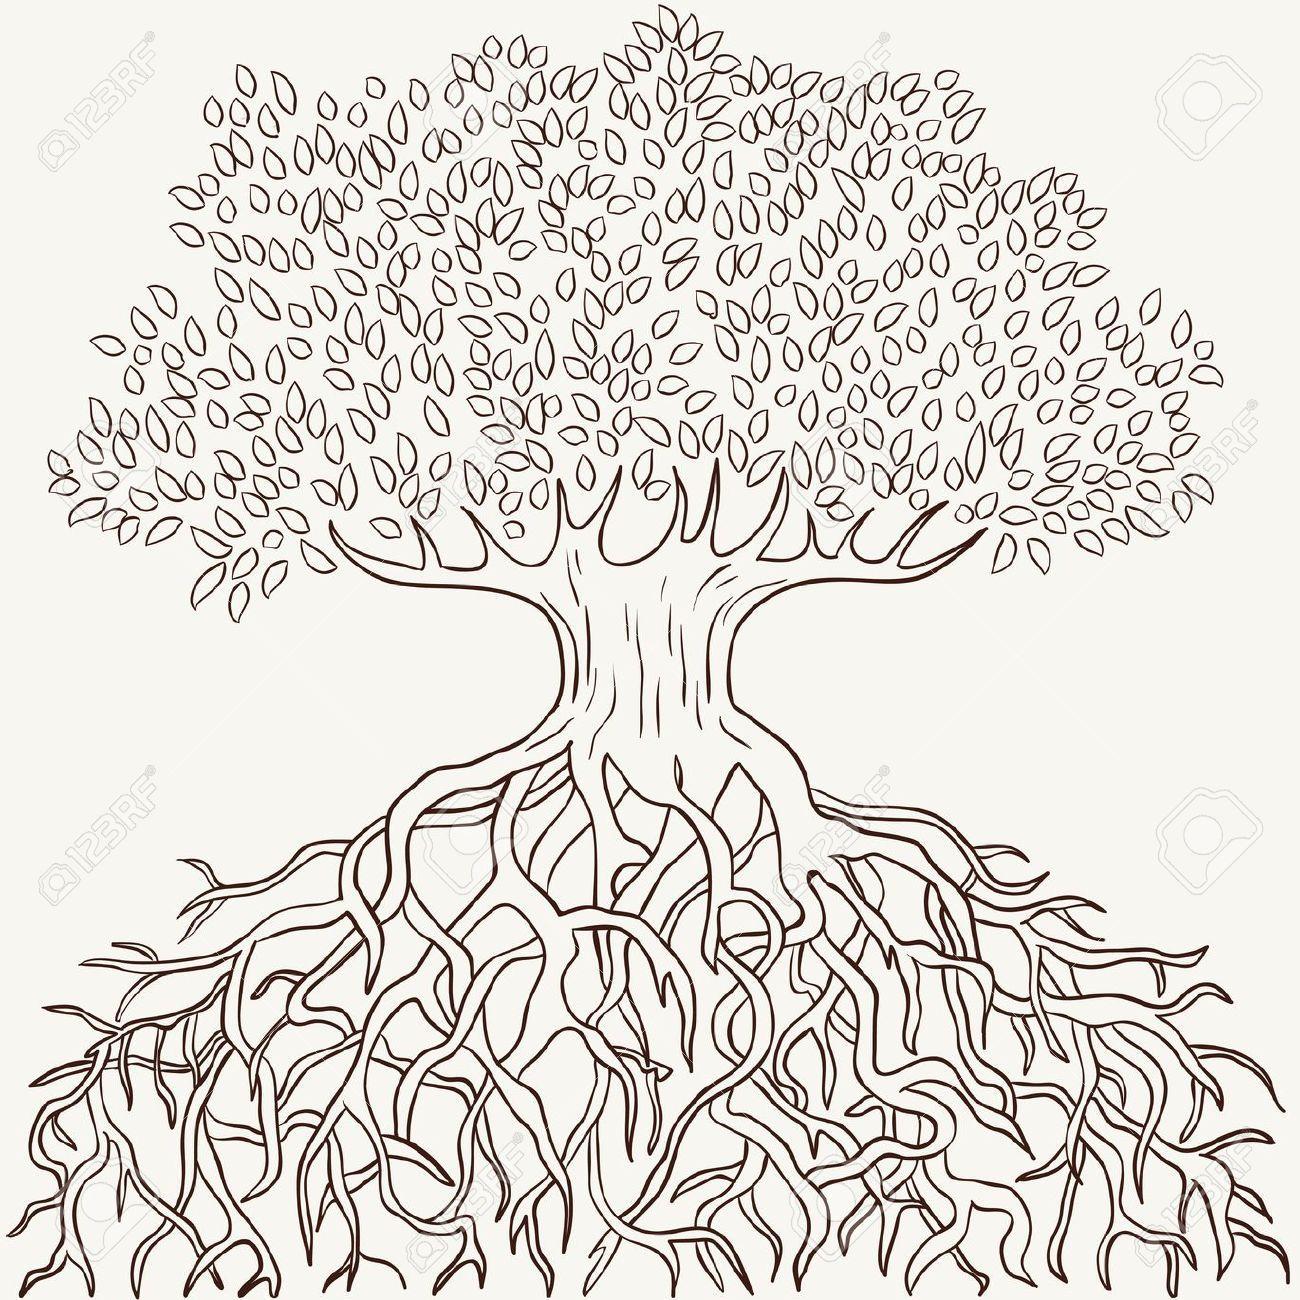 Tree Templates To Print Google Search Abstrakte Baume Baumbilder Abstrakt